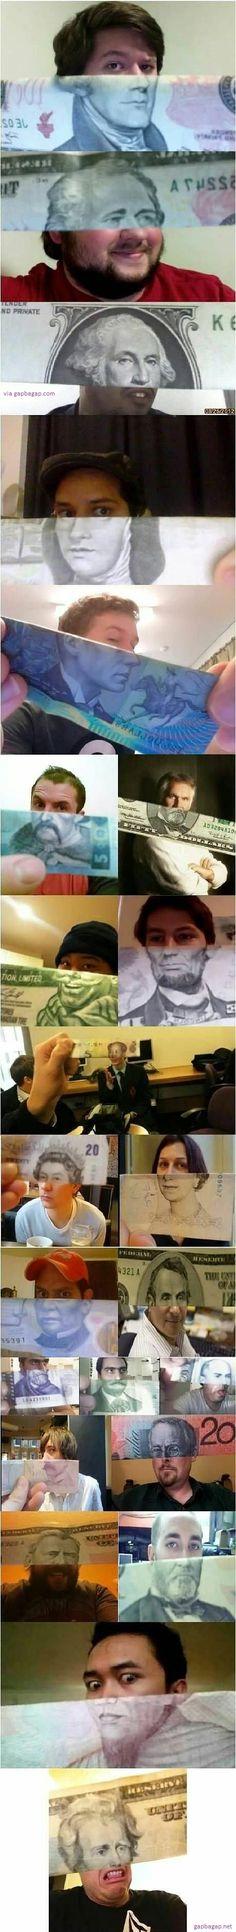 Funny Pictures Of Random People vs Money